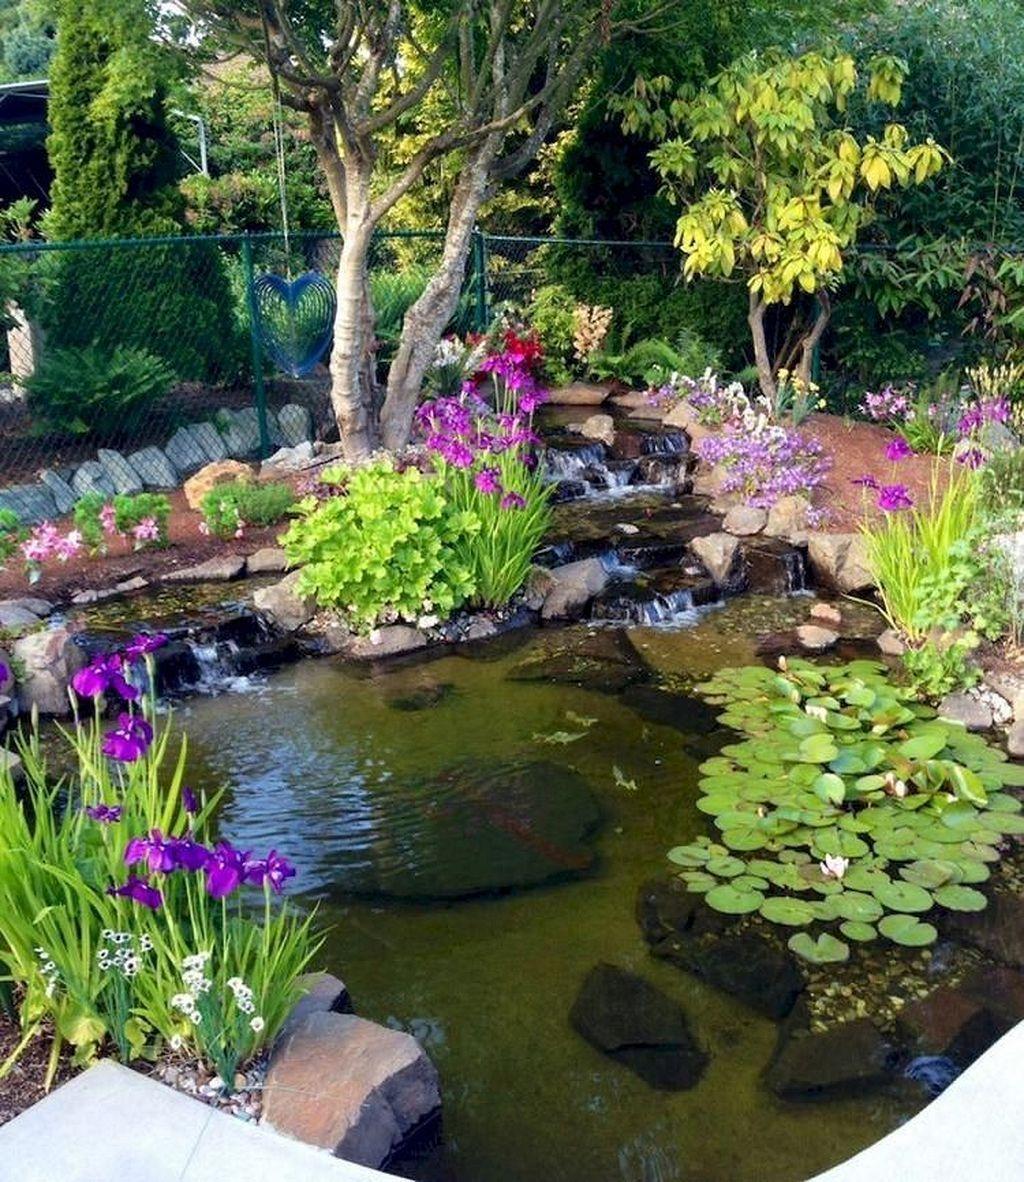 14 Adorable Luxury Backyard Garden Ideas In 2020 Garden Pond Design Water Features In The Garden Ponds Backyard